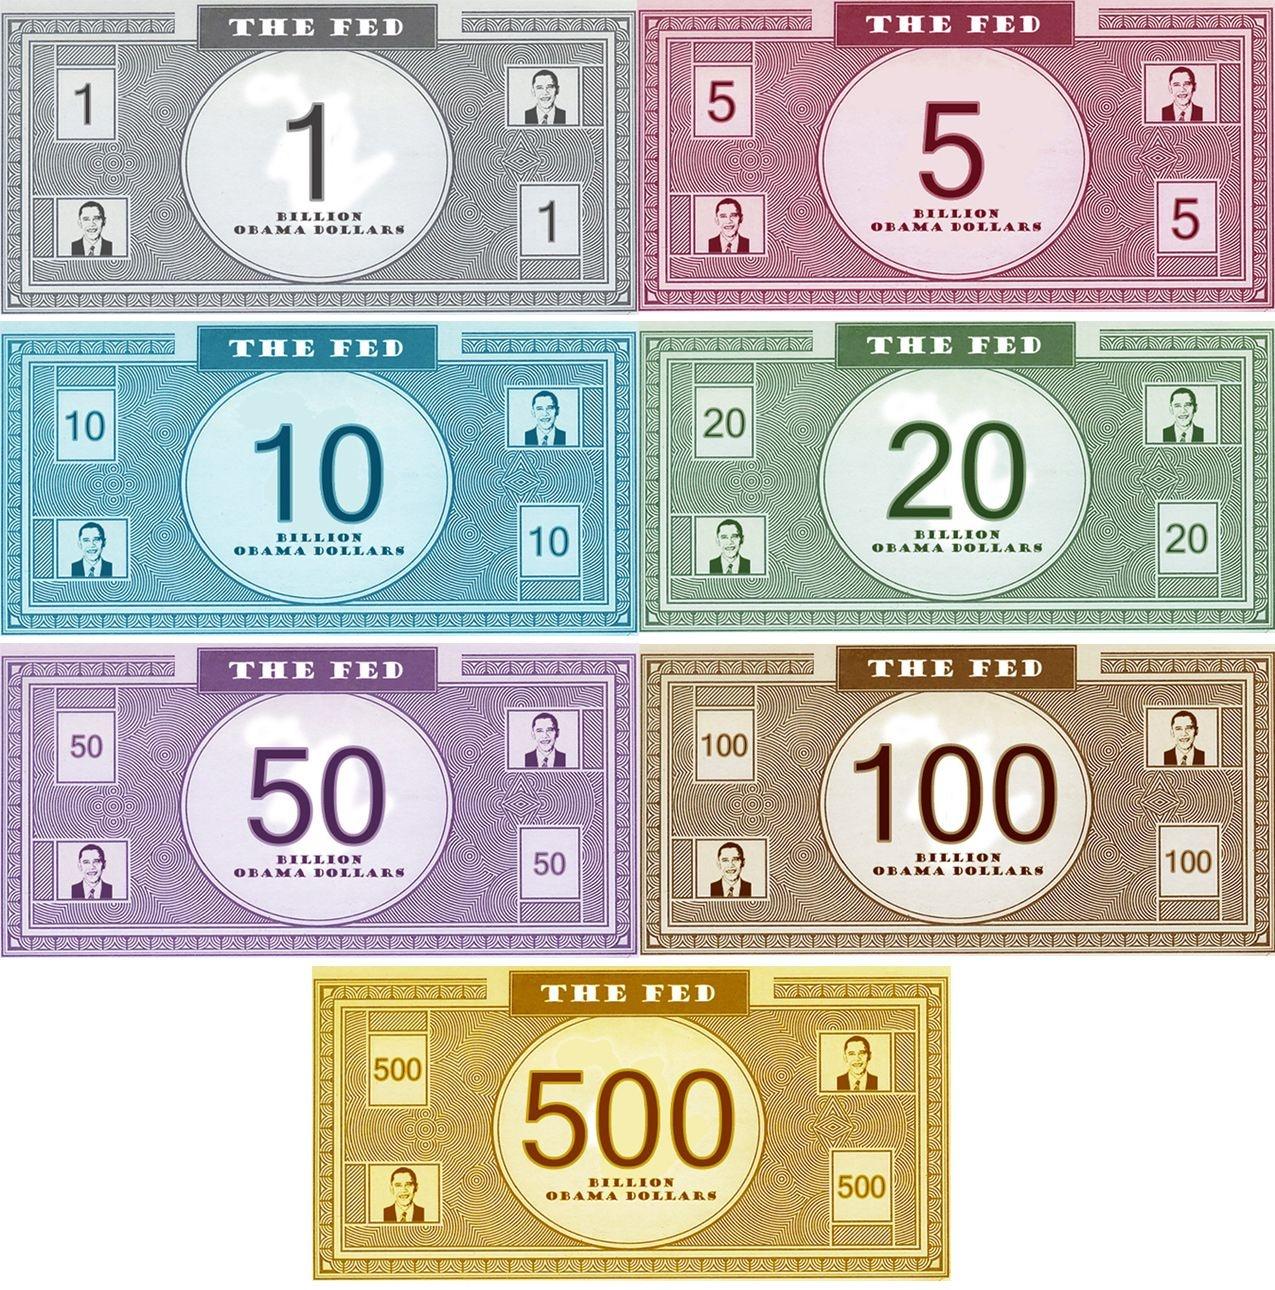 Game Money Template - Kaza.psstech.co - Free Printable Game Money